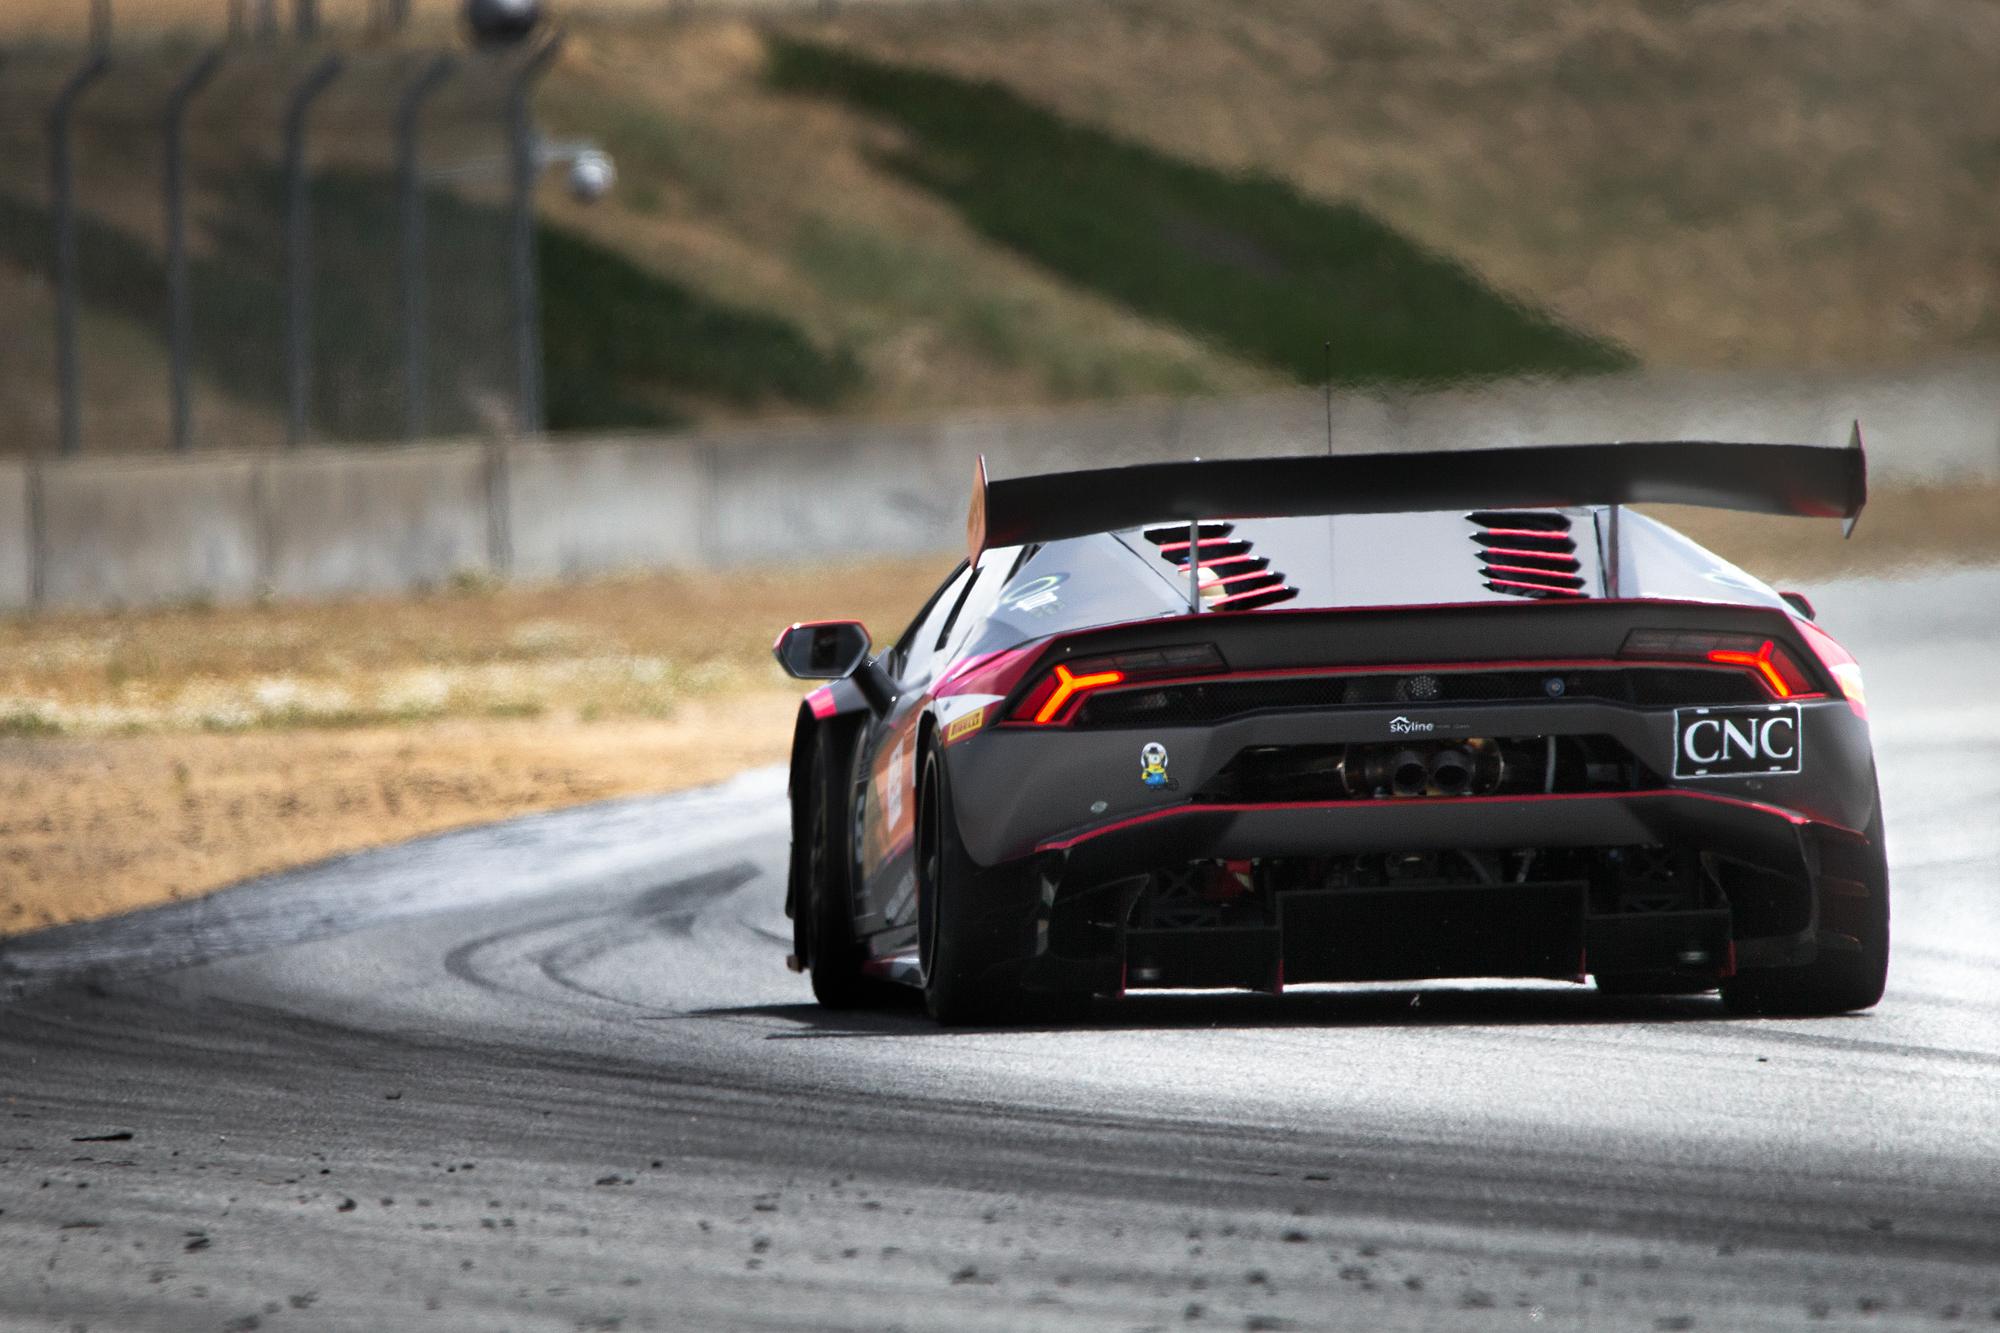 Steven-Racing-Laguna-20180531-96216.jpg